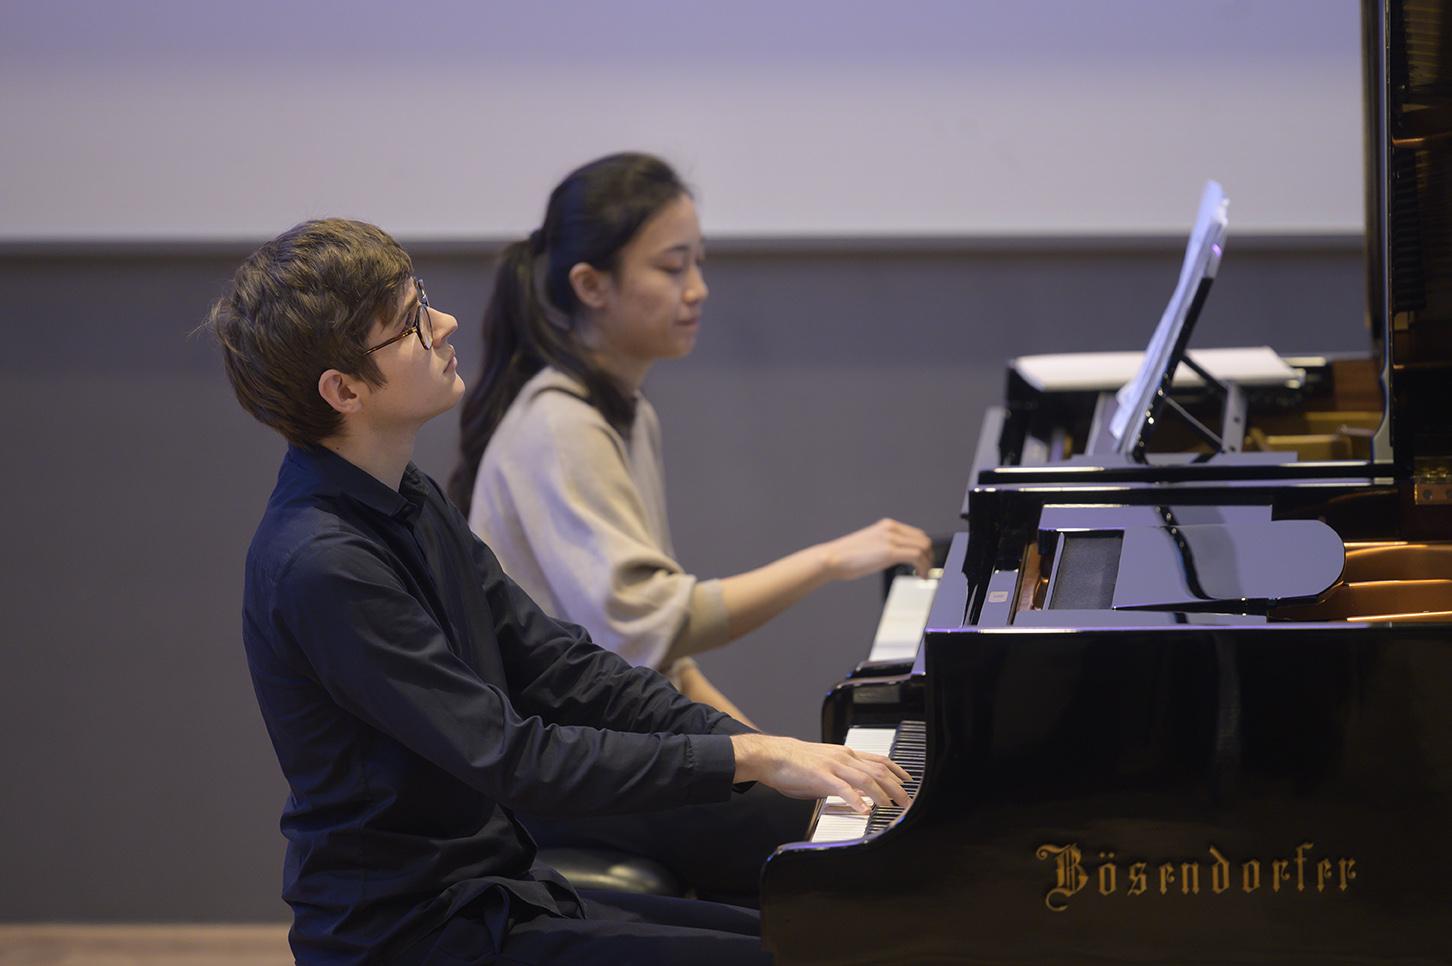 Jérémie Conus, Finalist Rahn Musikpreis 2020 für Klavier